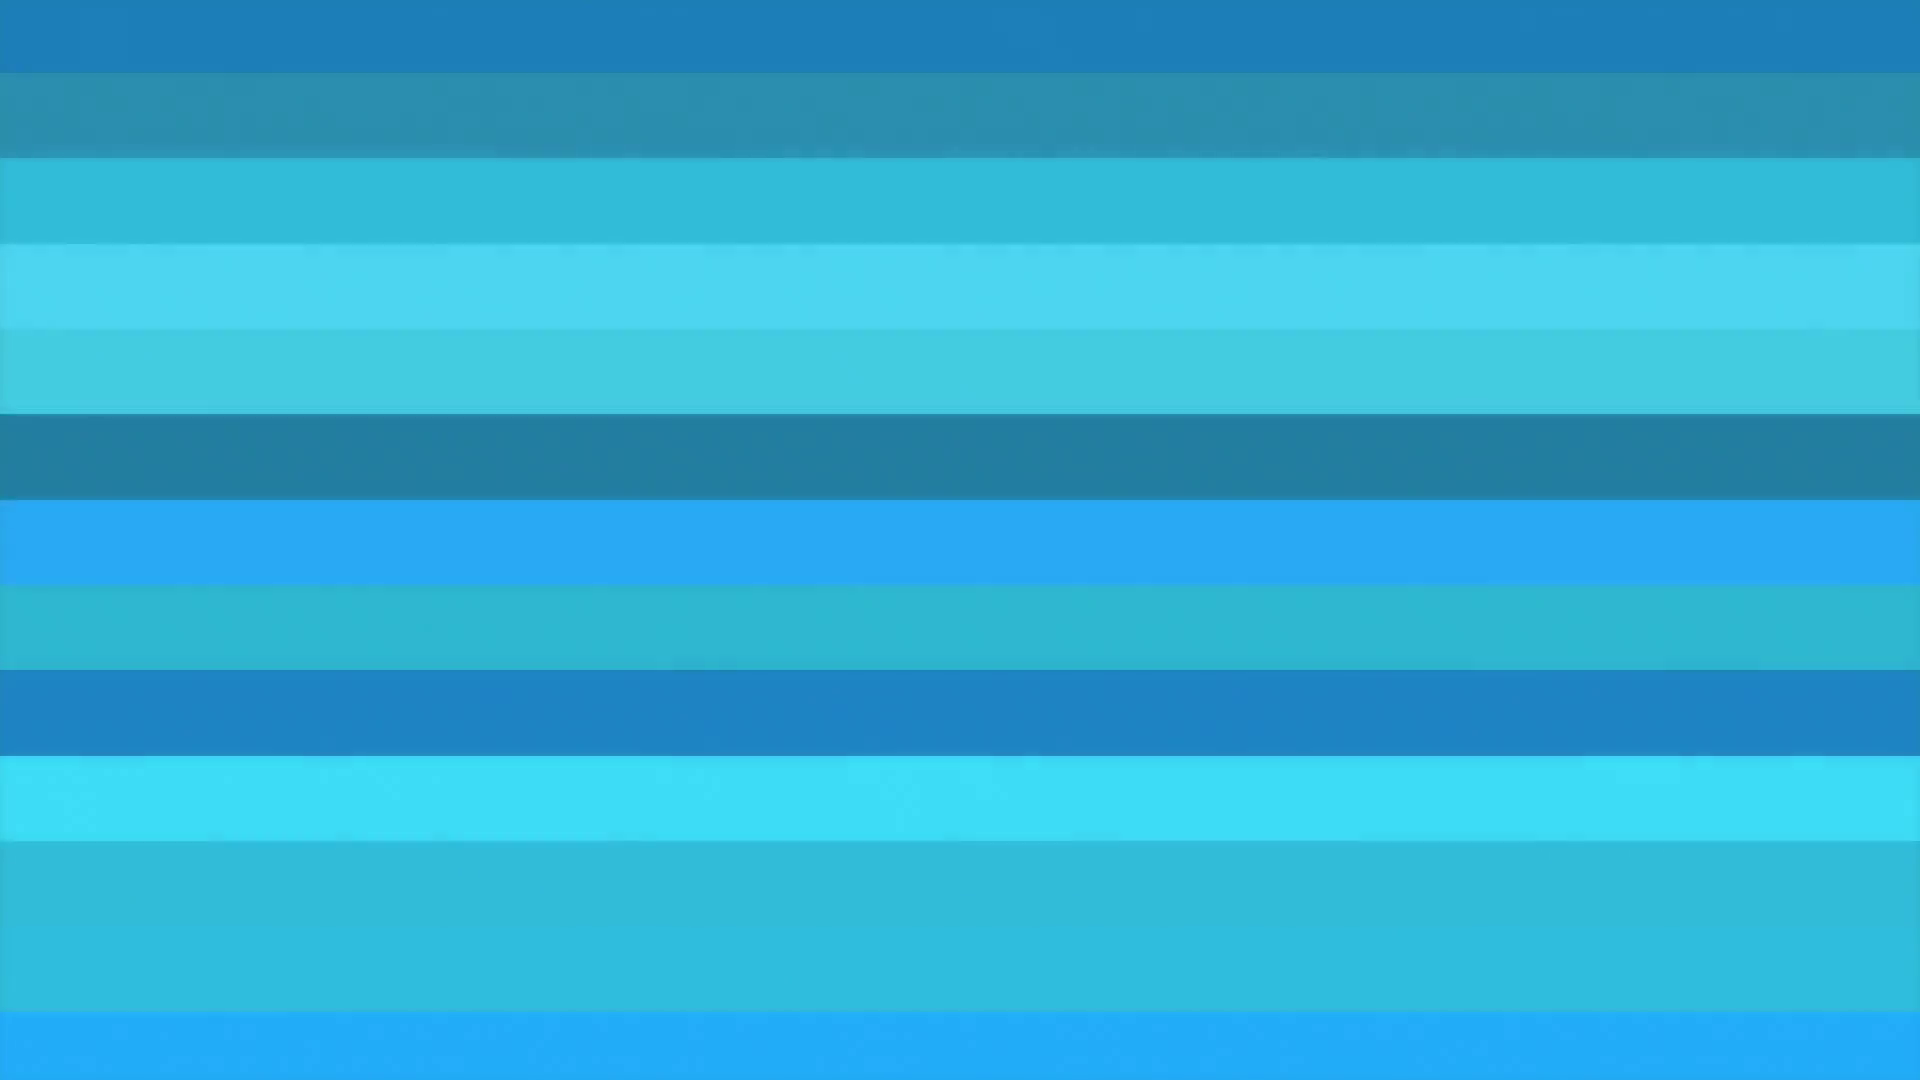 Blue Horizontal Bars Stripes Shifting Cycle Abstract Motion 1920x1080